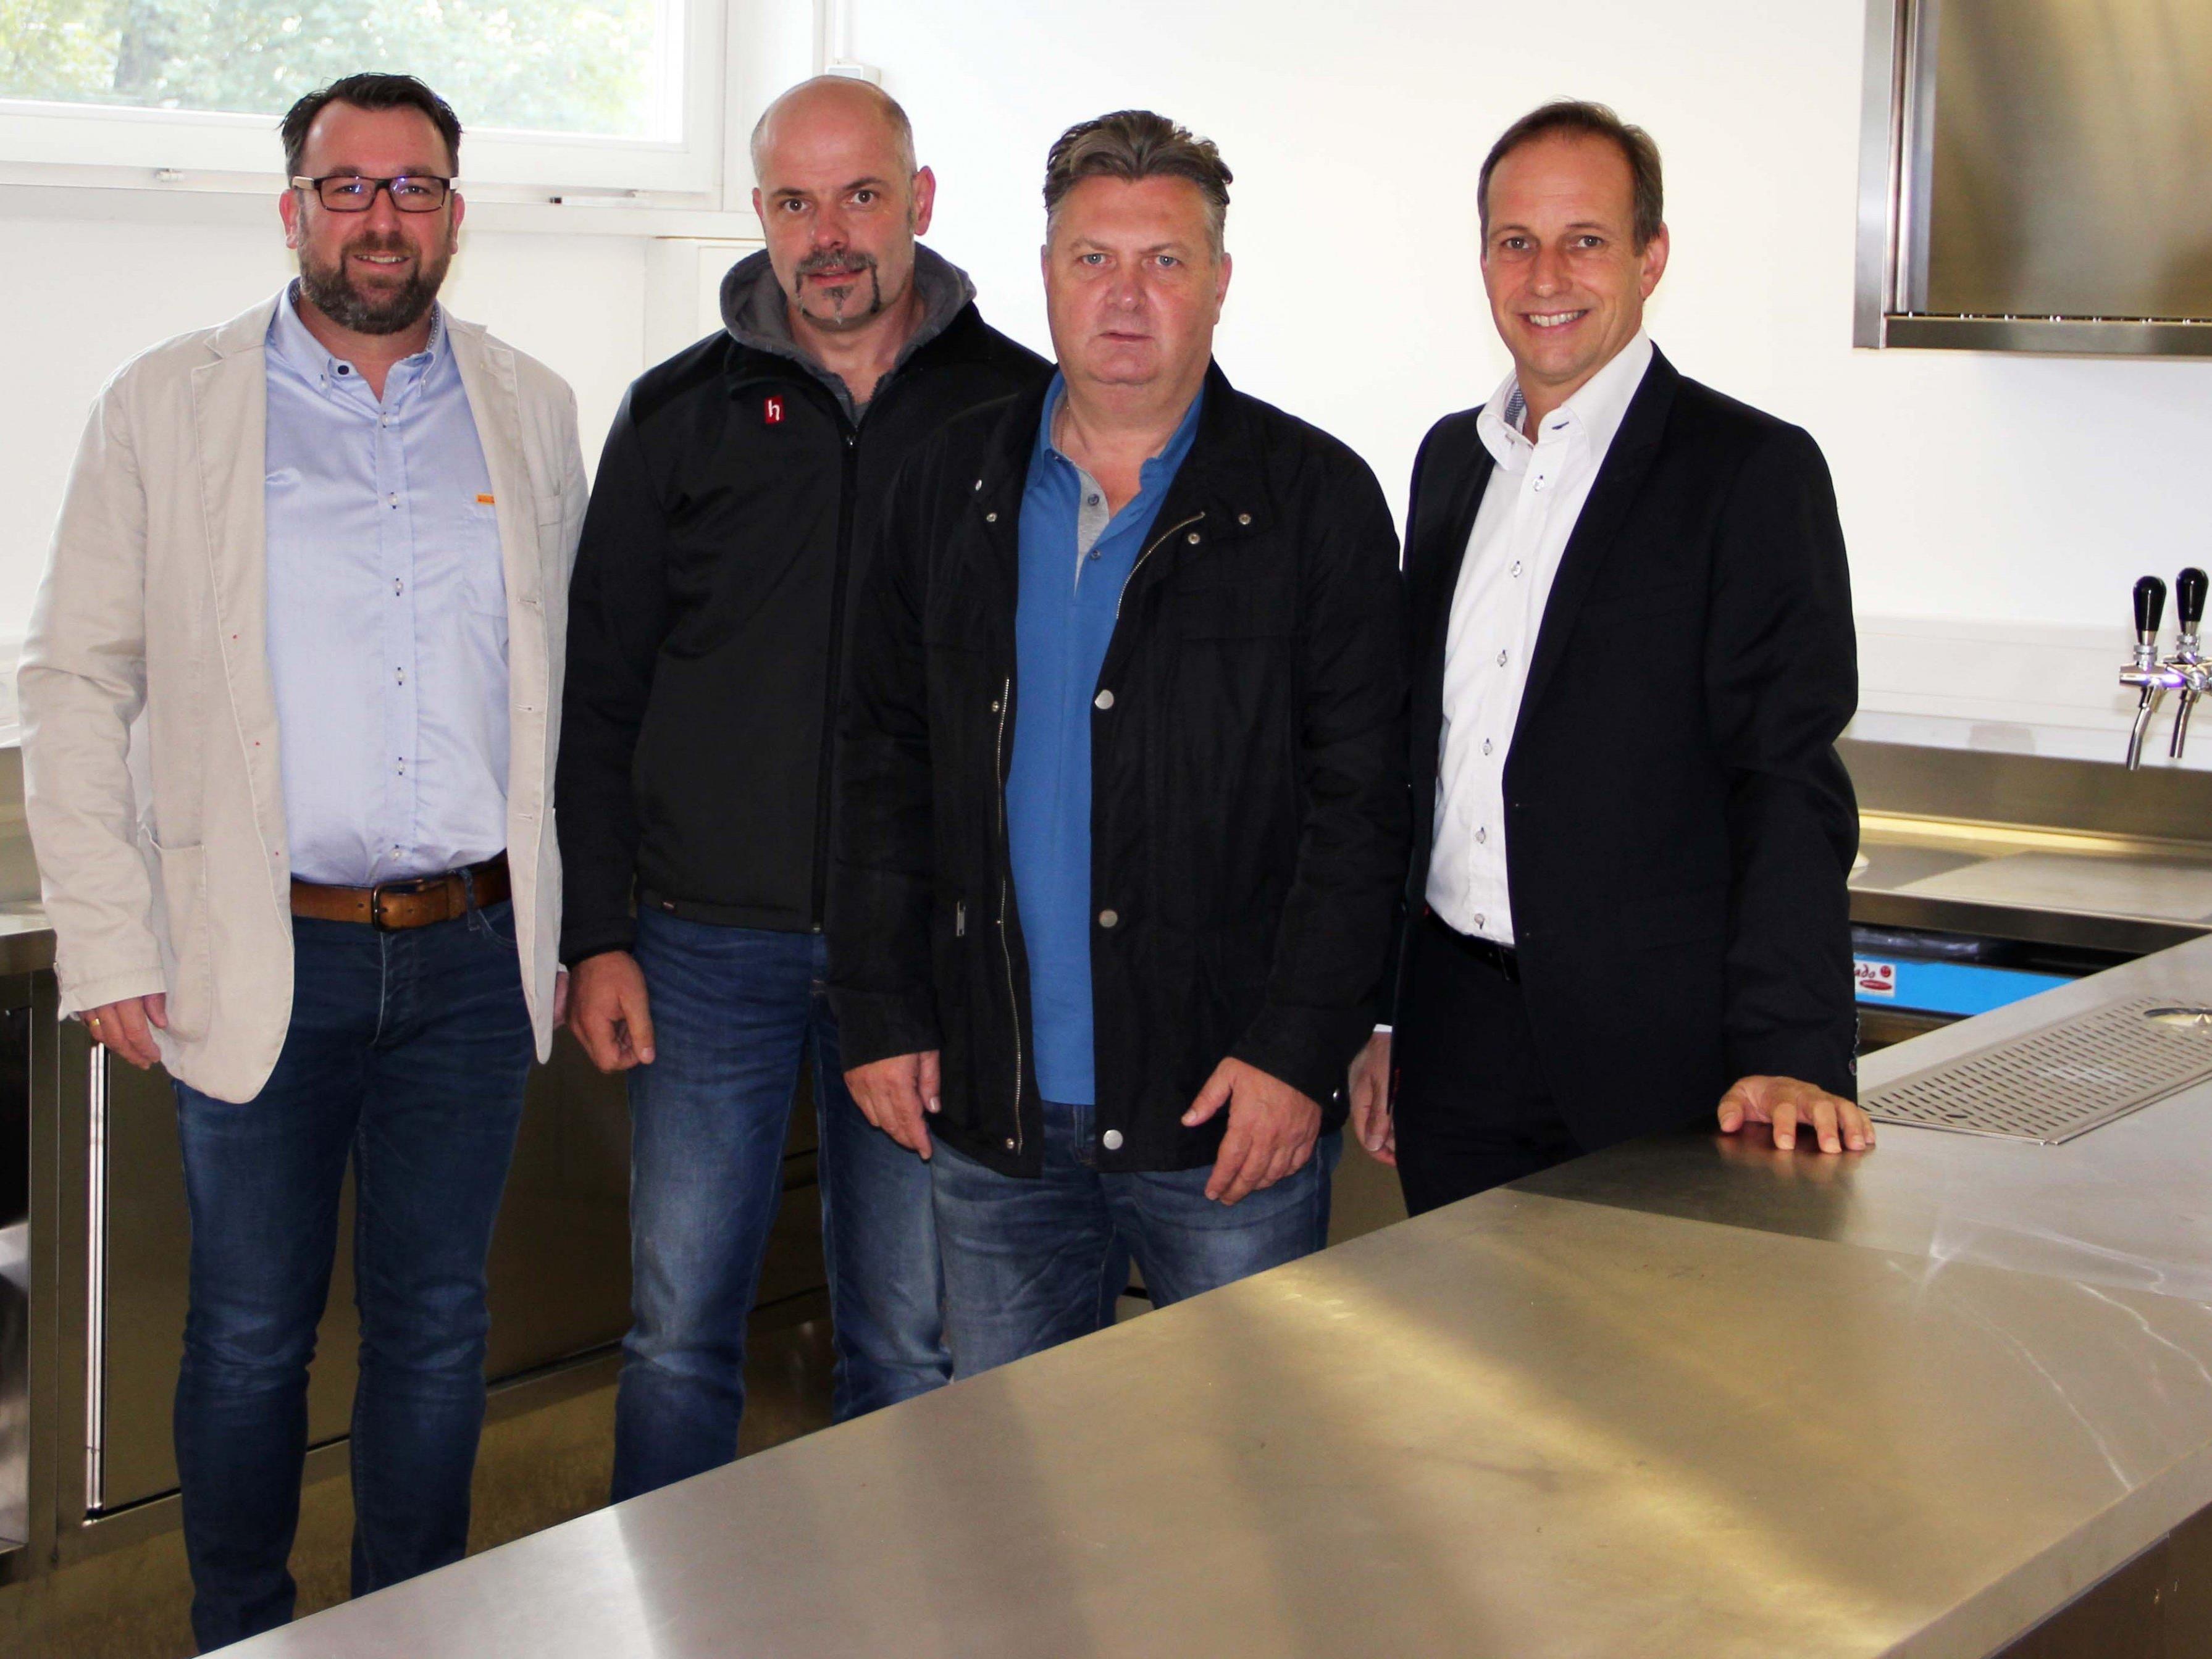 v. l. Dietmar Amann, Oliver Marte, StR. Friedl Dold, Bgm. Dieter Egger